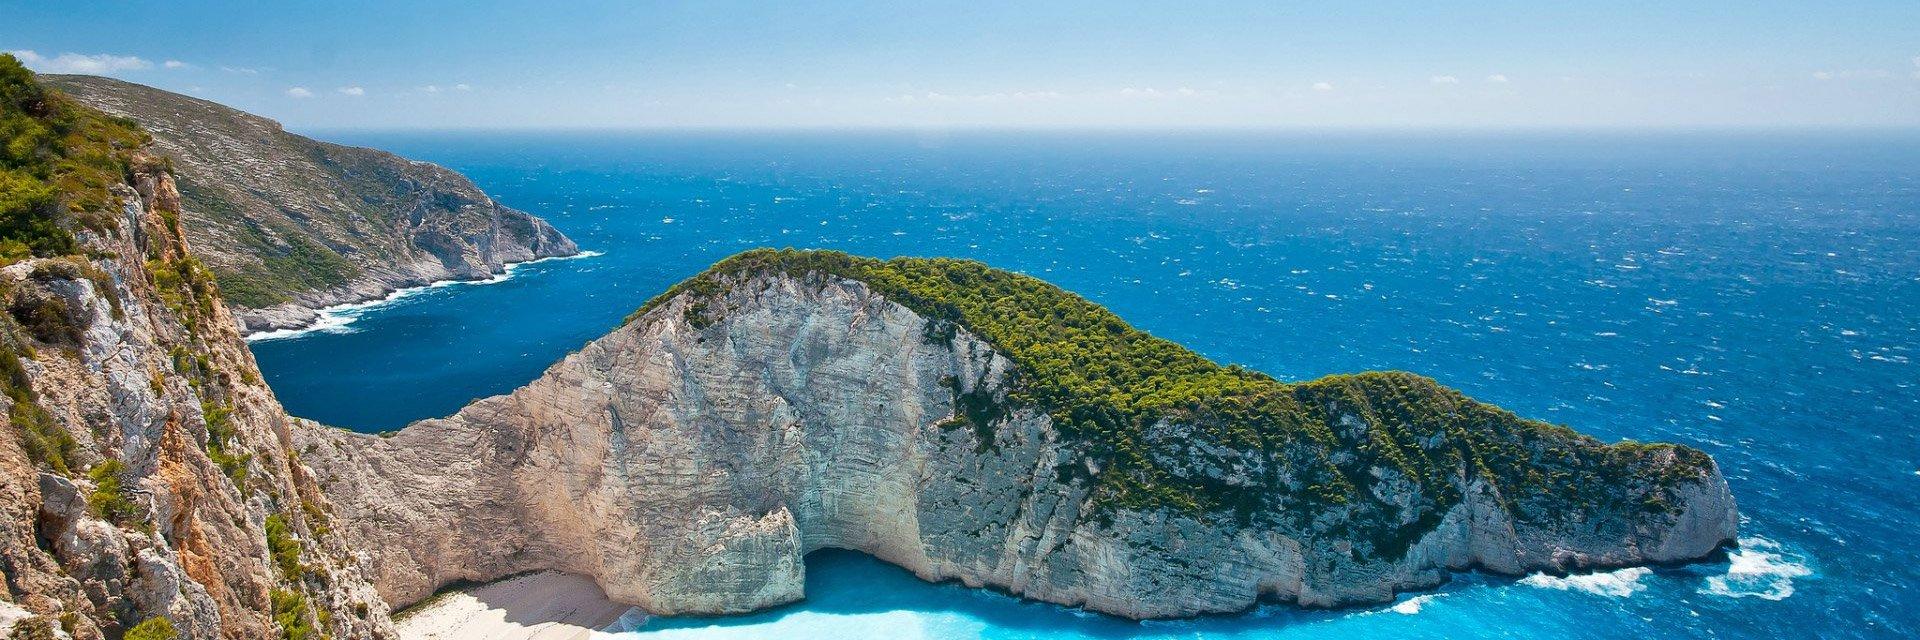 Arkin Palm Beach Hotel 5* (Айя-Напа, Кипр) - цены, отзывы, фото, бронирование - ПАКС